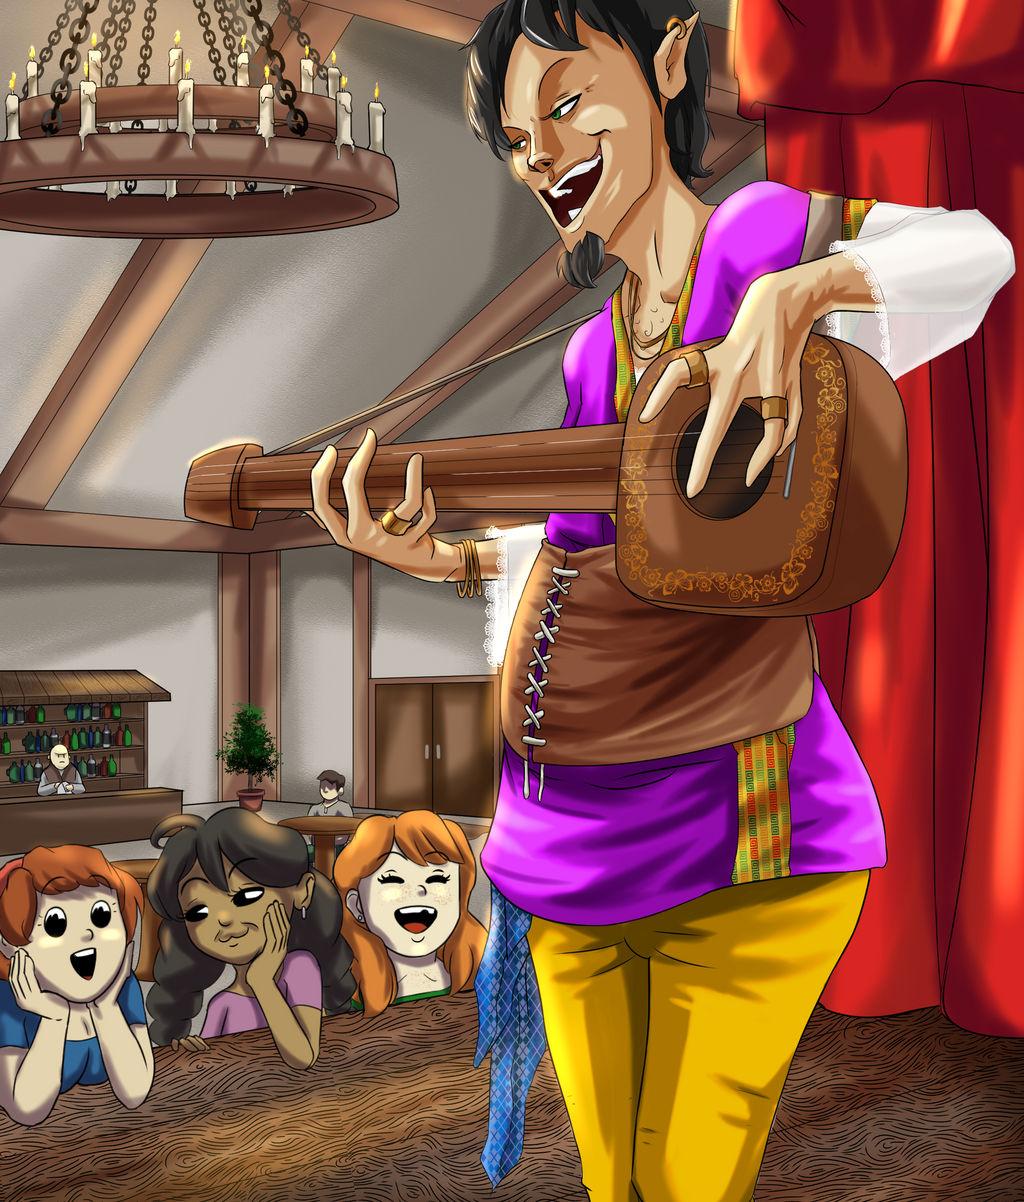 Adventurers - Wandering Bard by FieryJinx